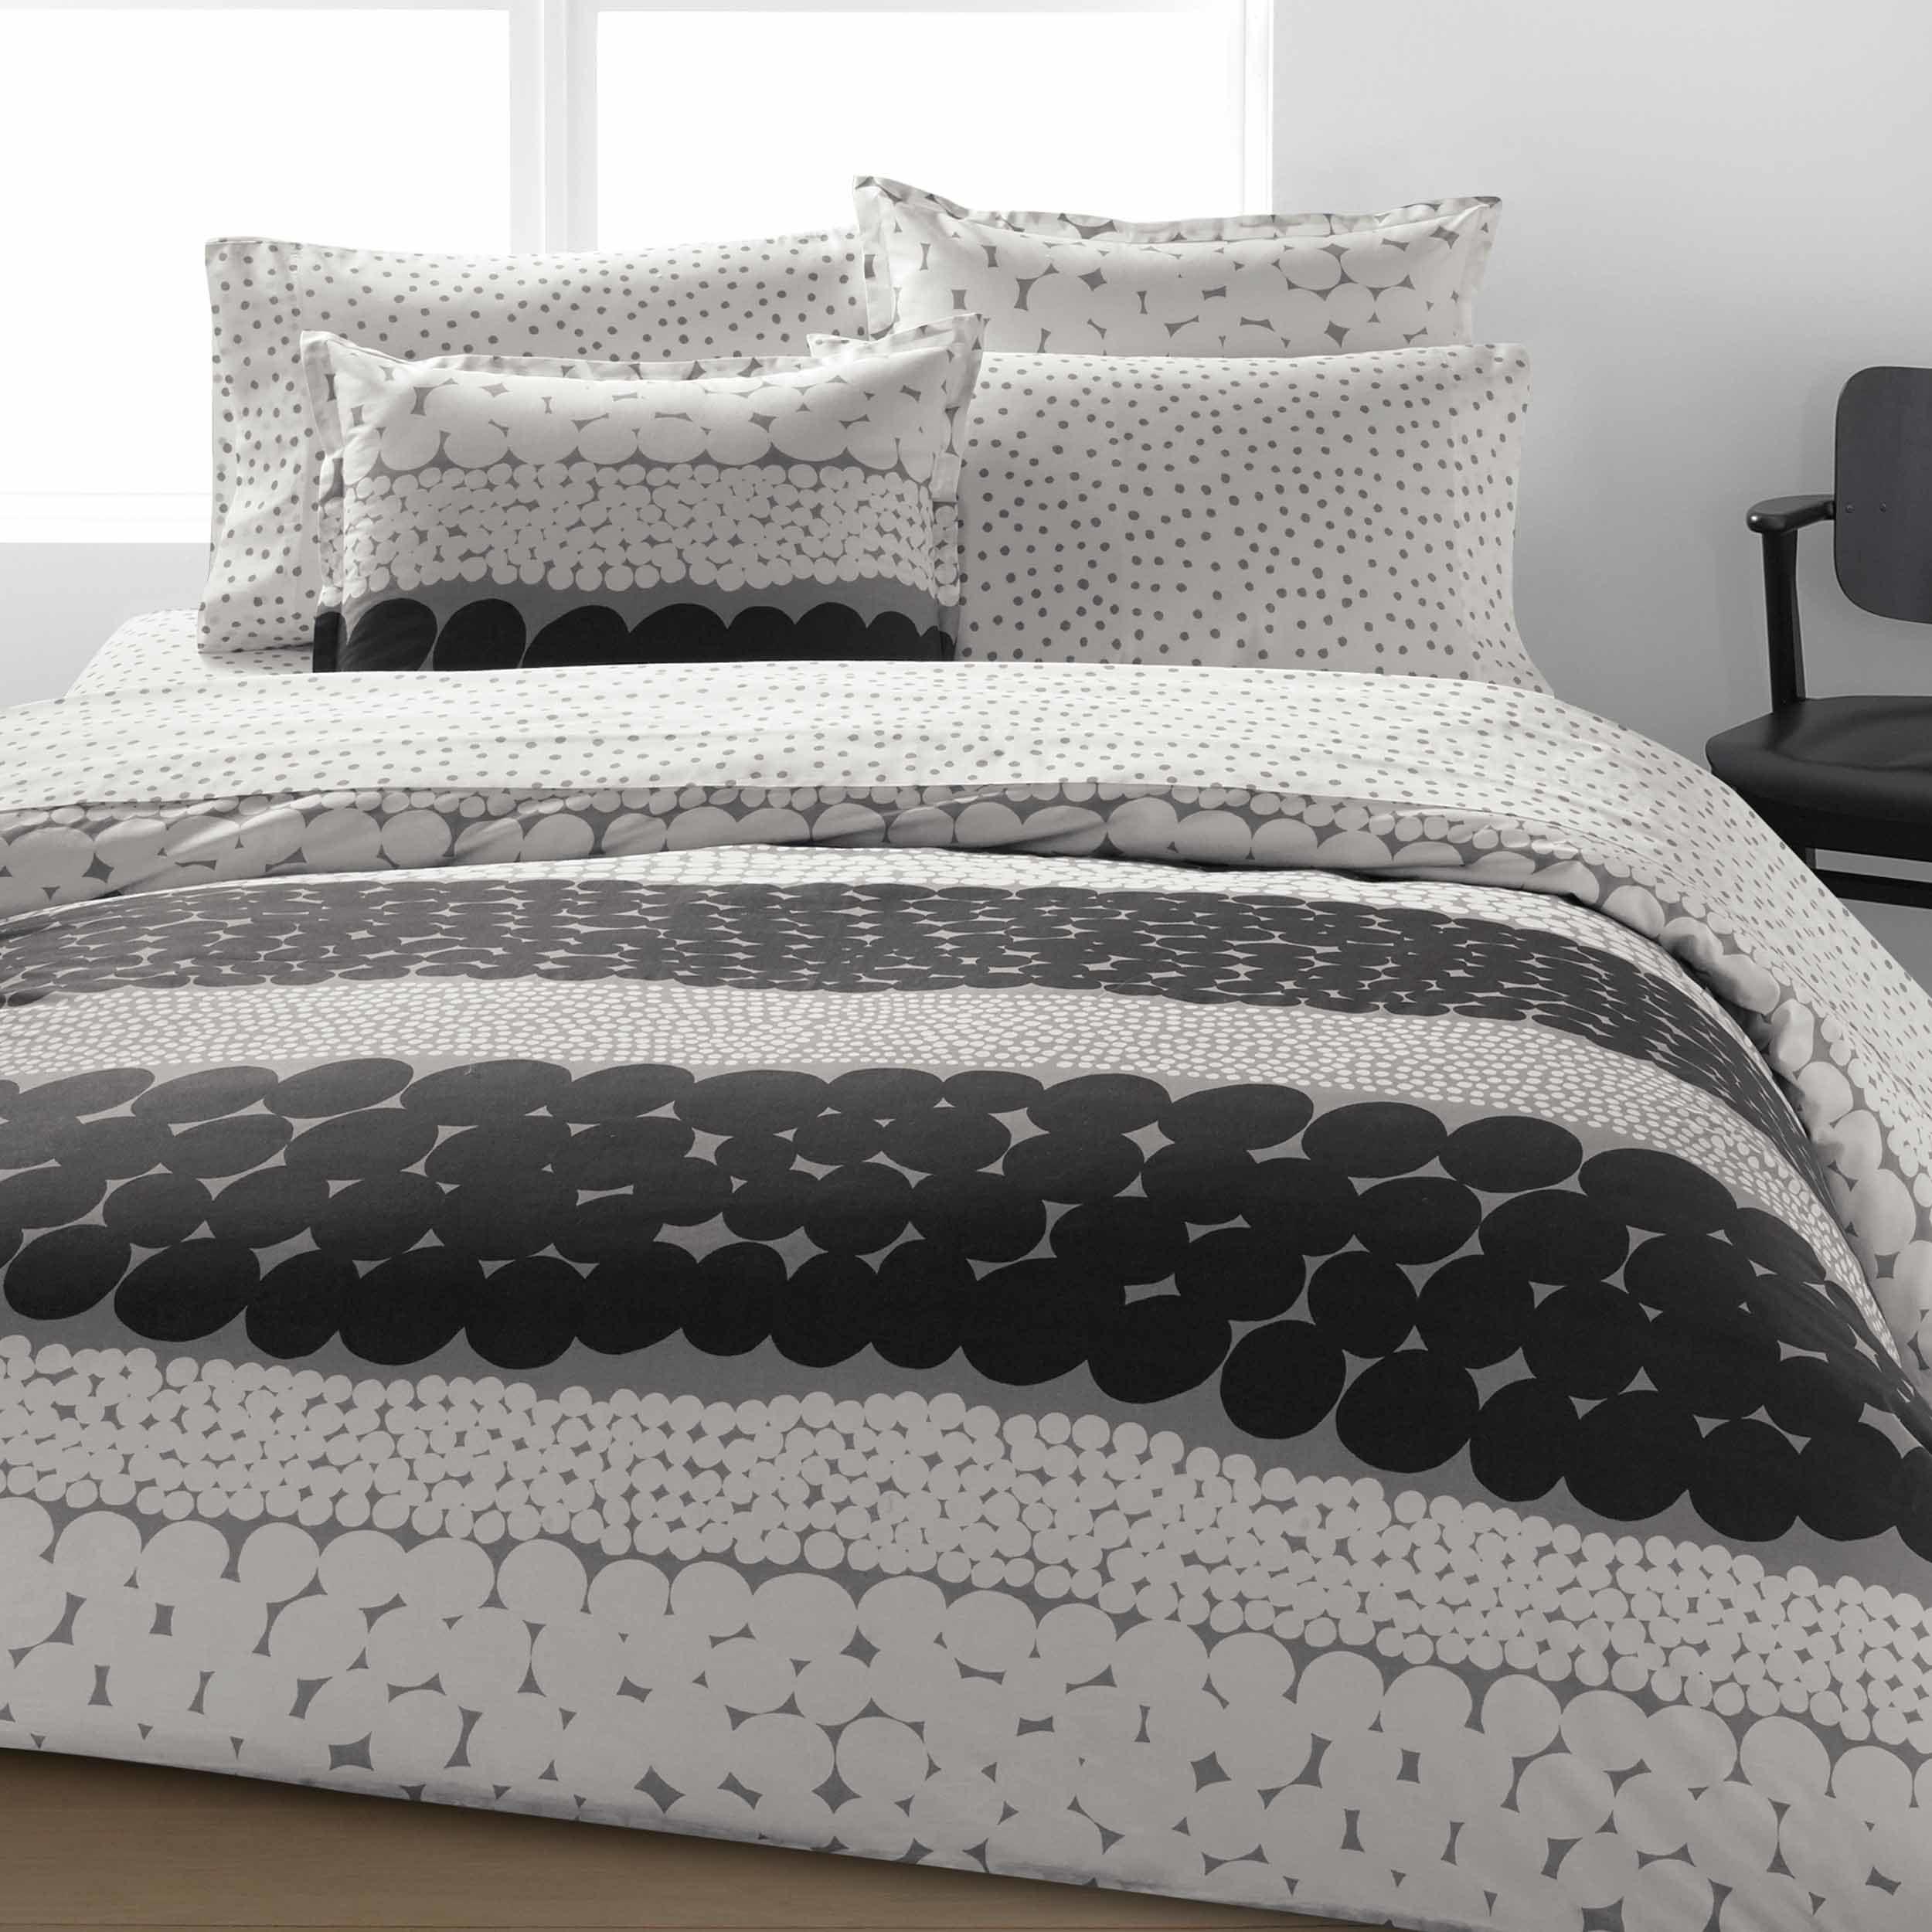 orange piece bedding homes marimekko better medallion gray grey rpisite com gardens bed and comforter